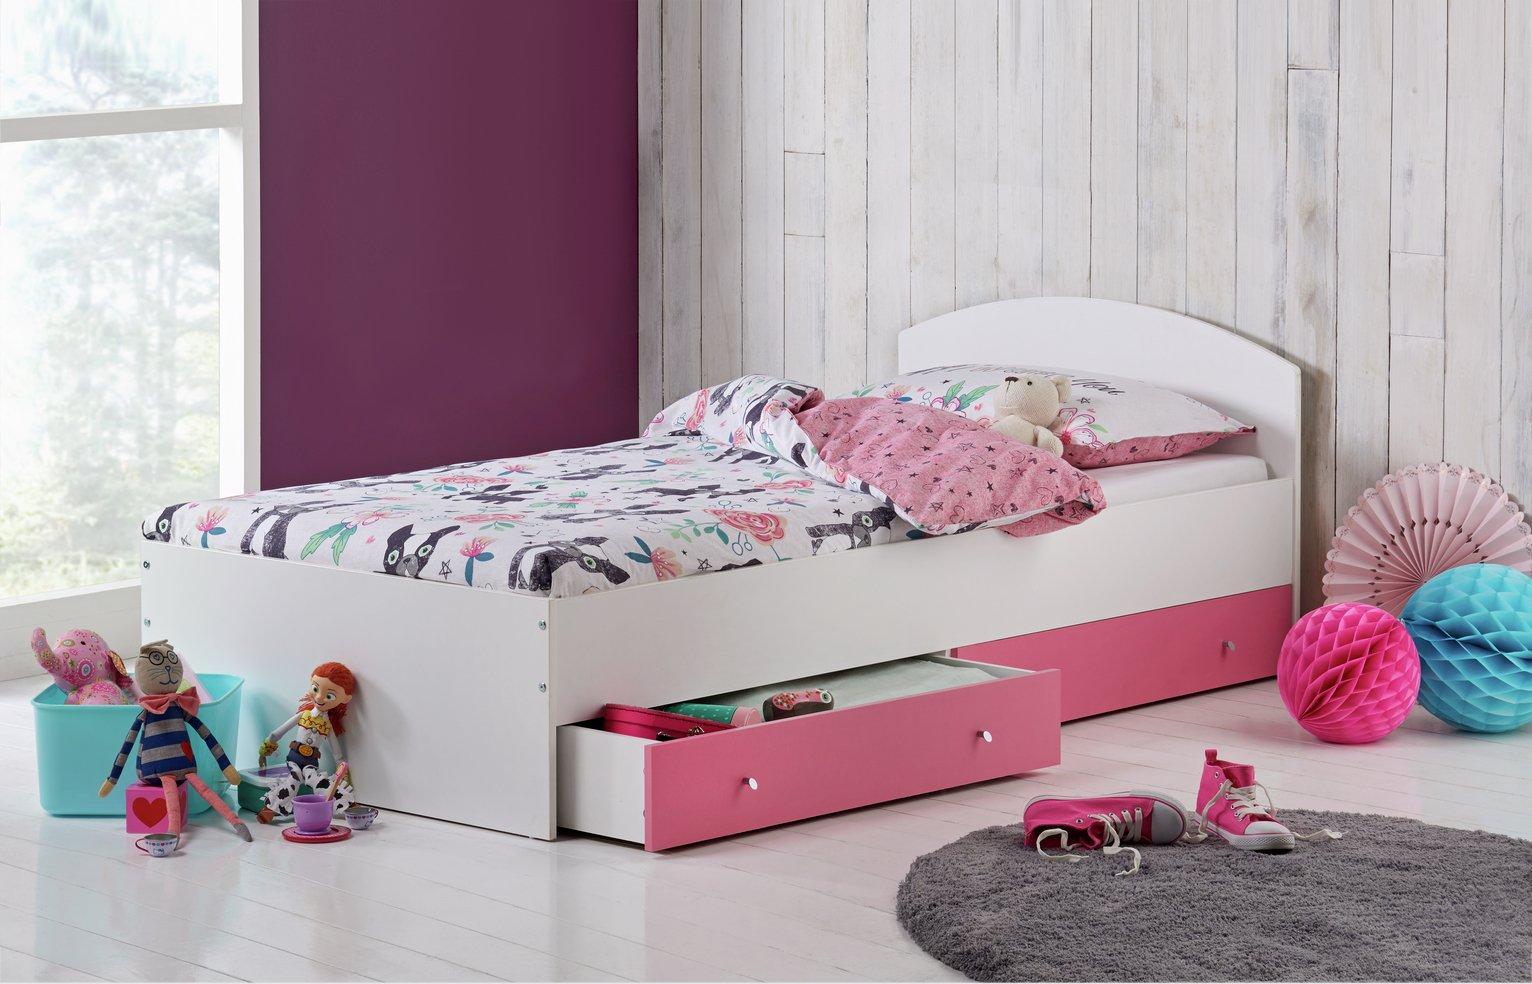 HOME Malibu Single Bed Frame - Pink & White.